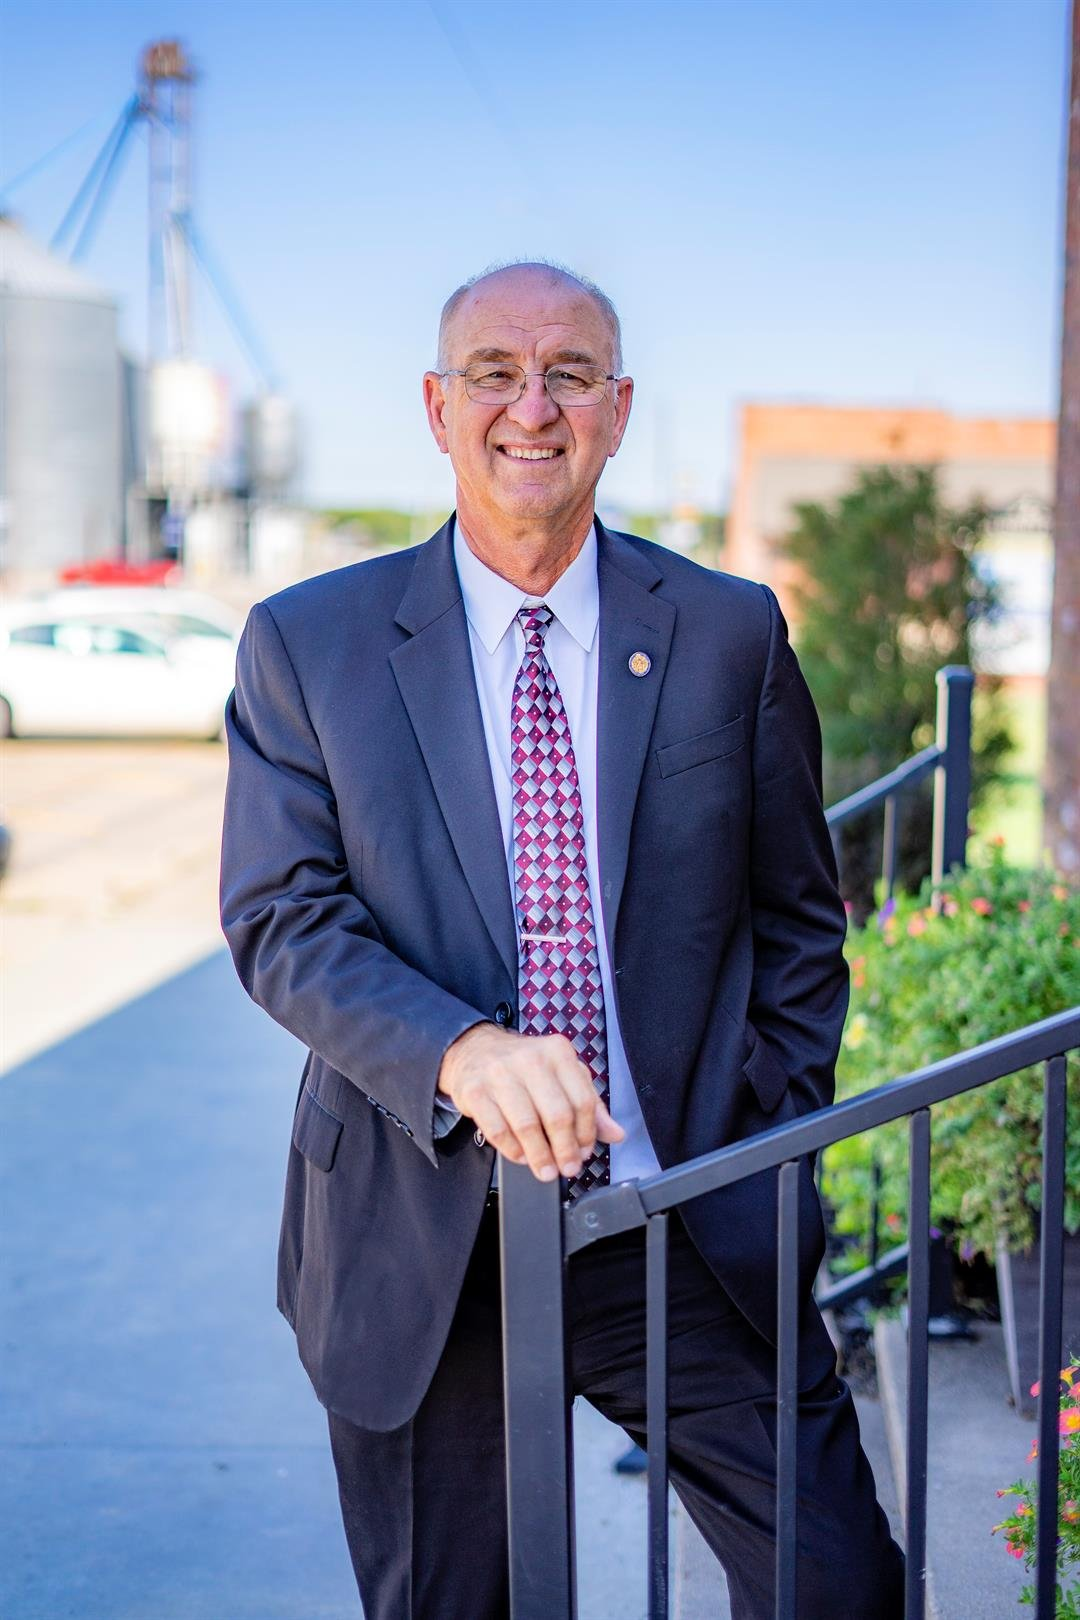 Adams lawmaker to seek second term